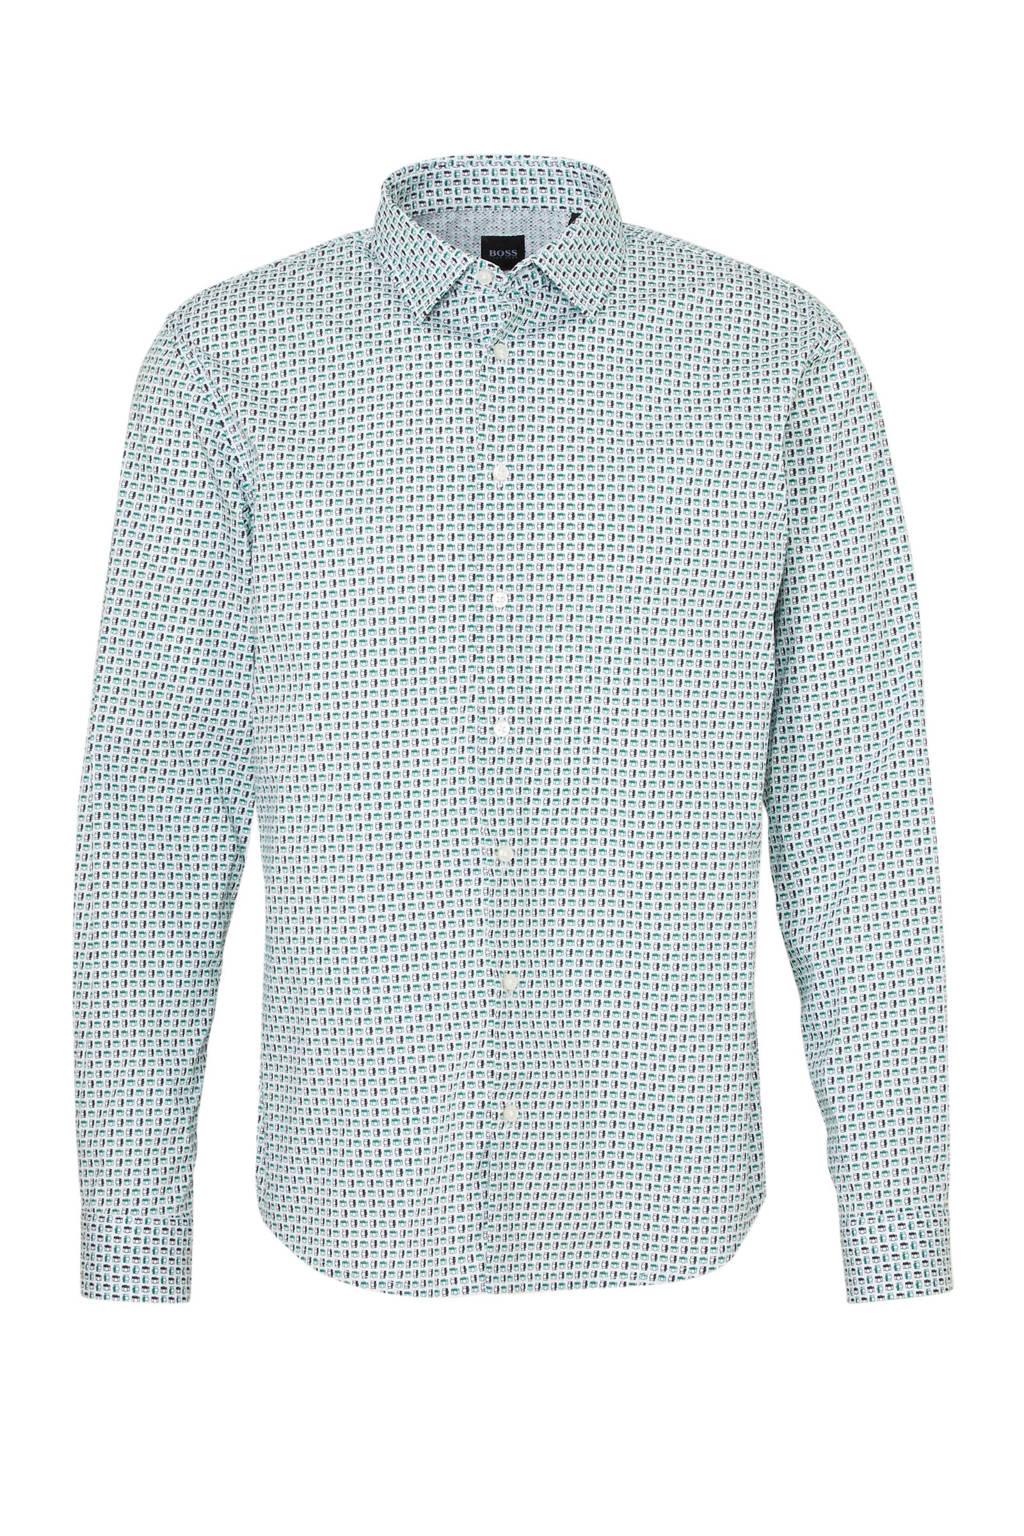 BOSS Casual slim fit overhemd met all over print wit/groen, Wit/groen